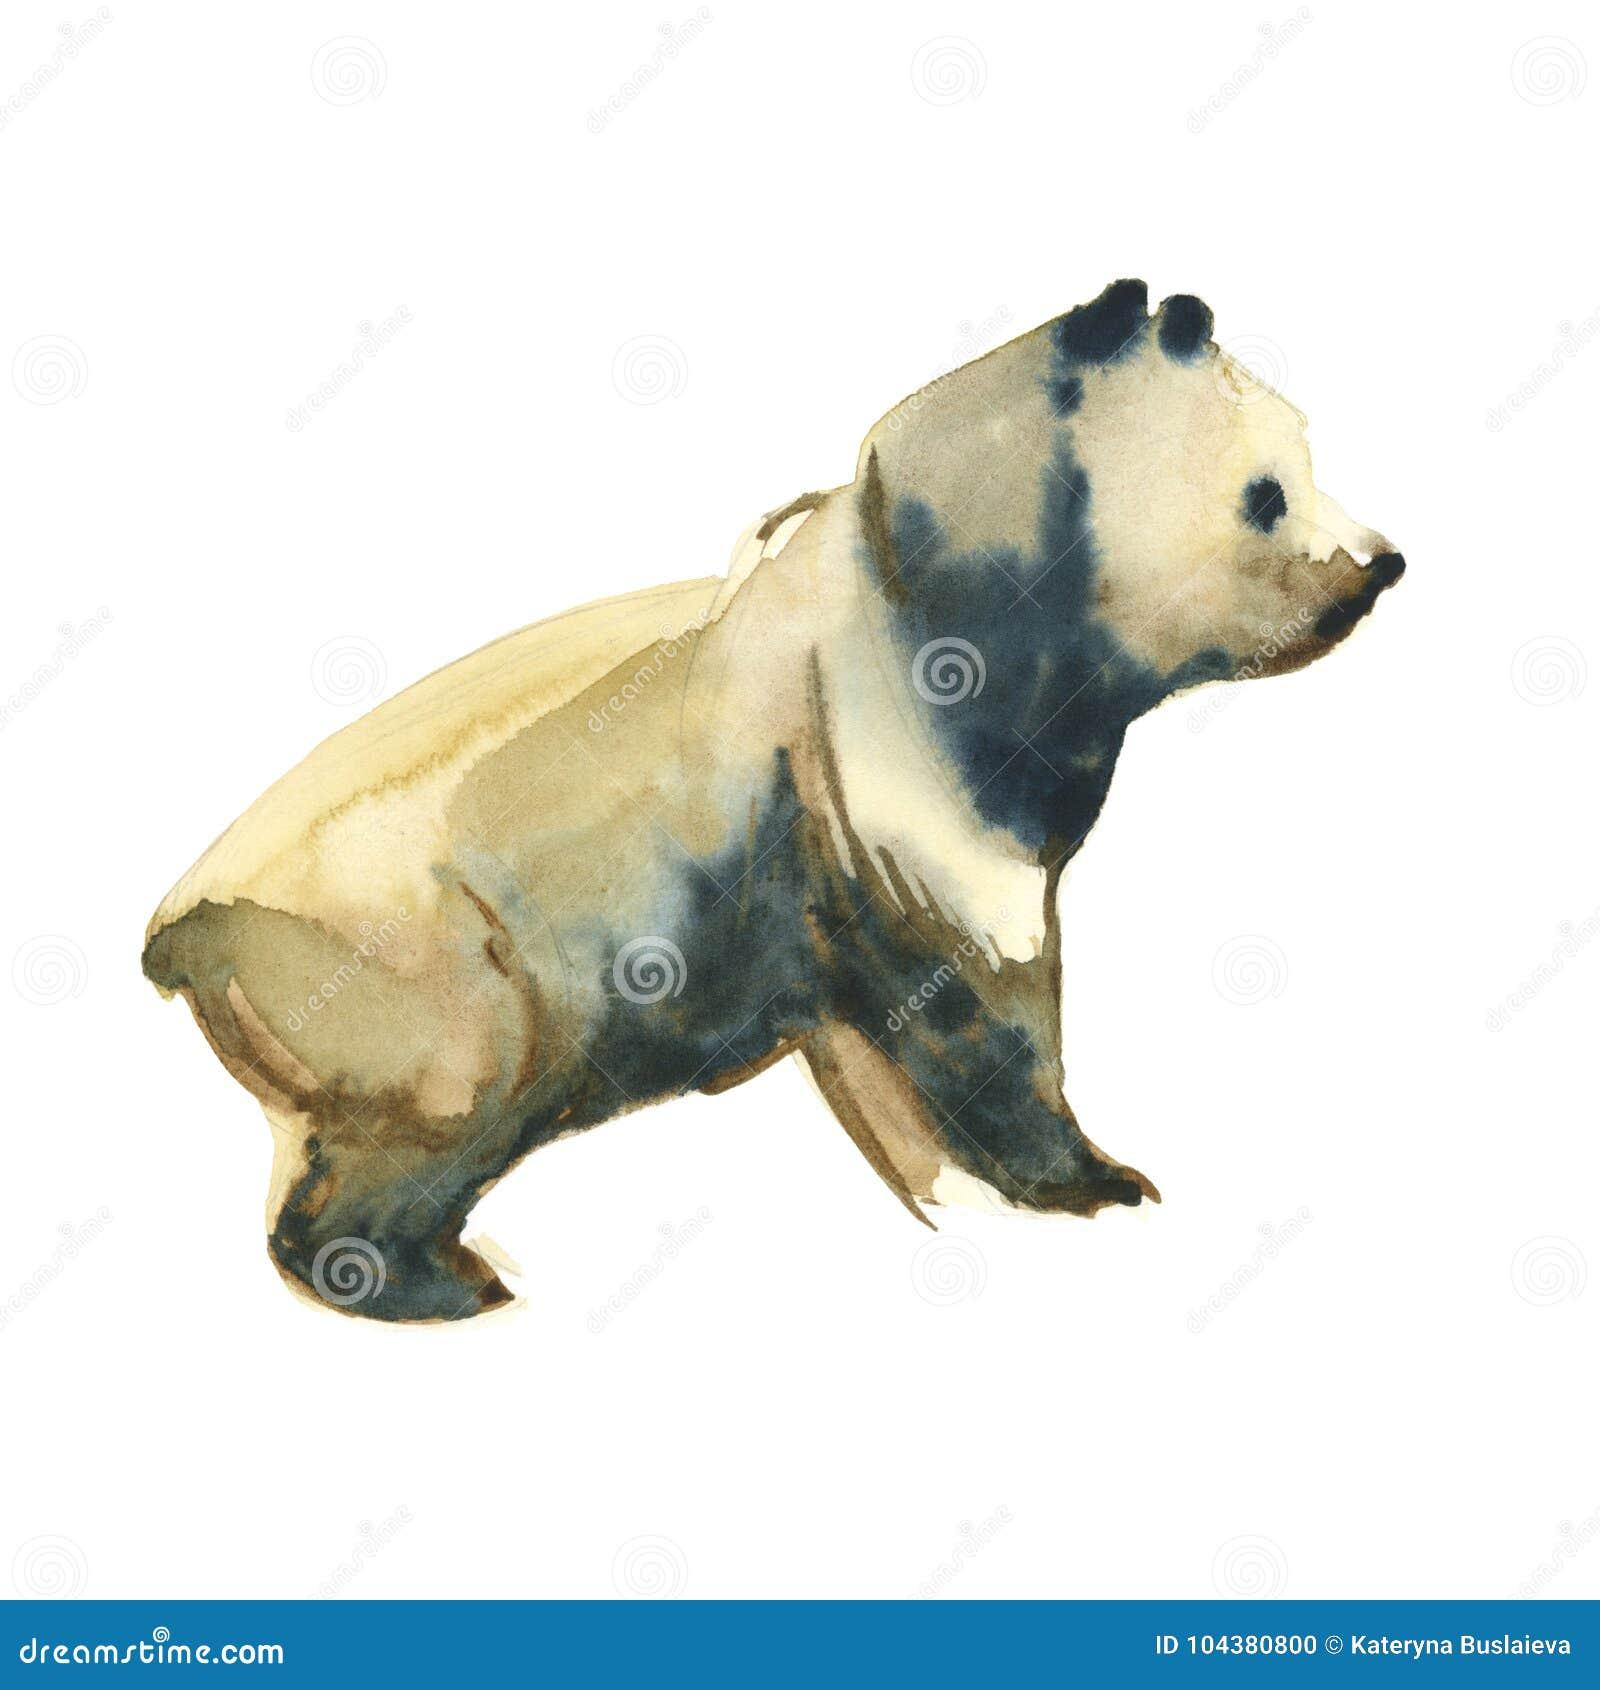 Giant panda bear foto royalty free immagini immagini e archivi